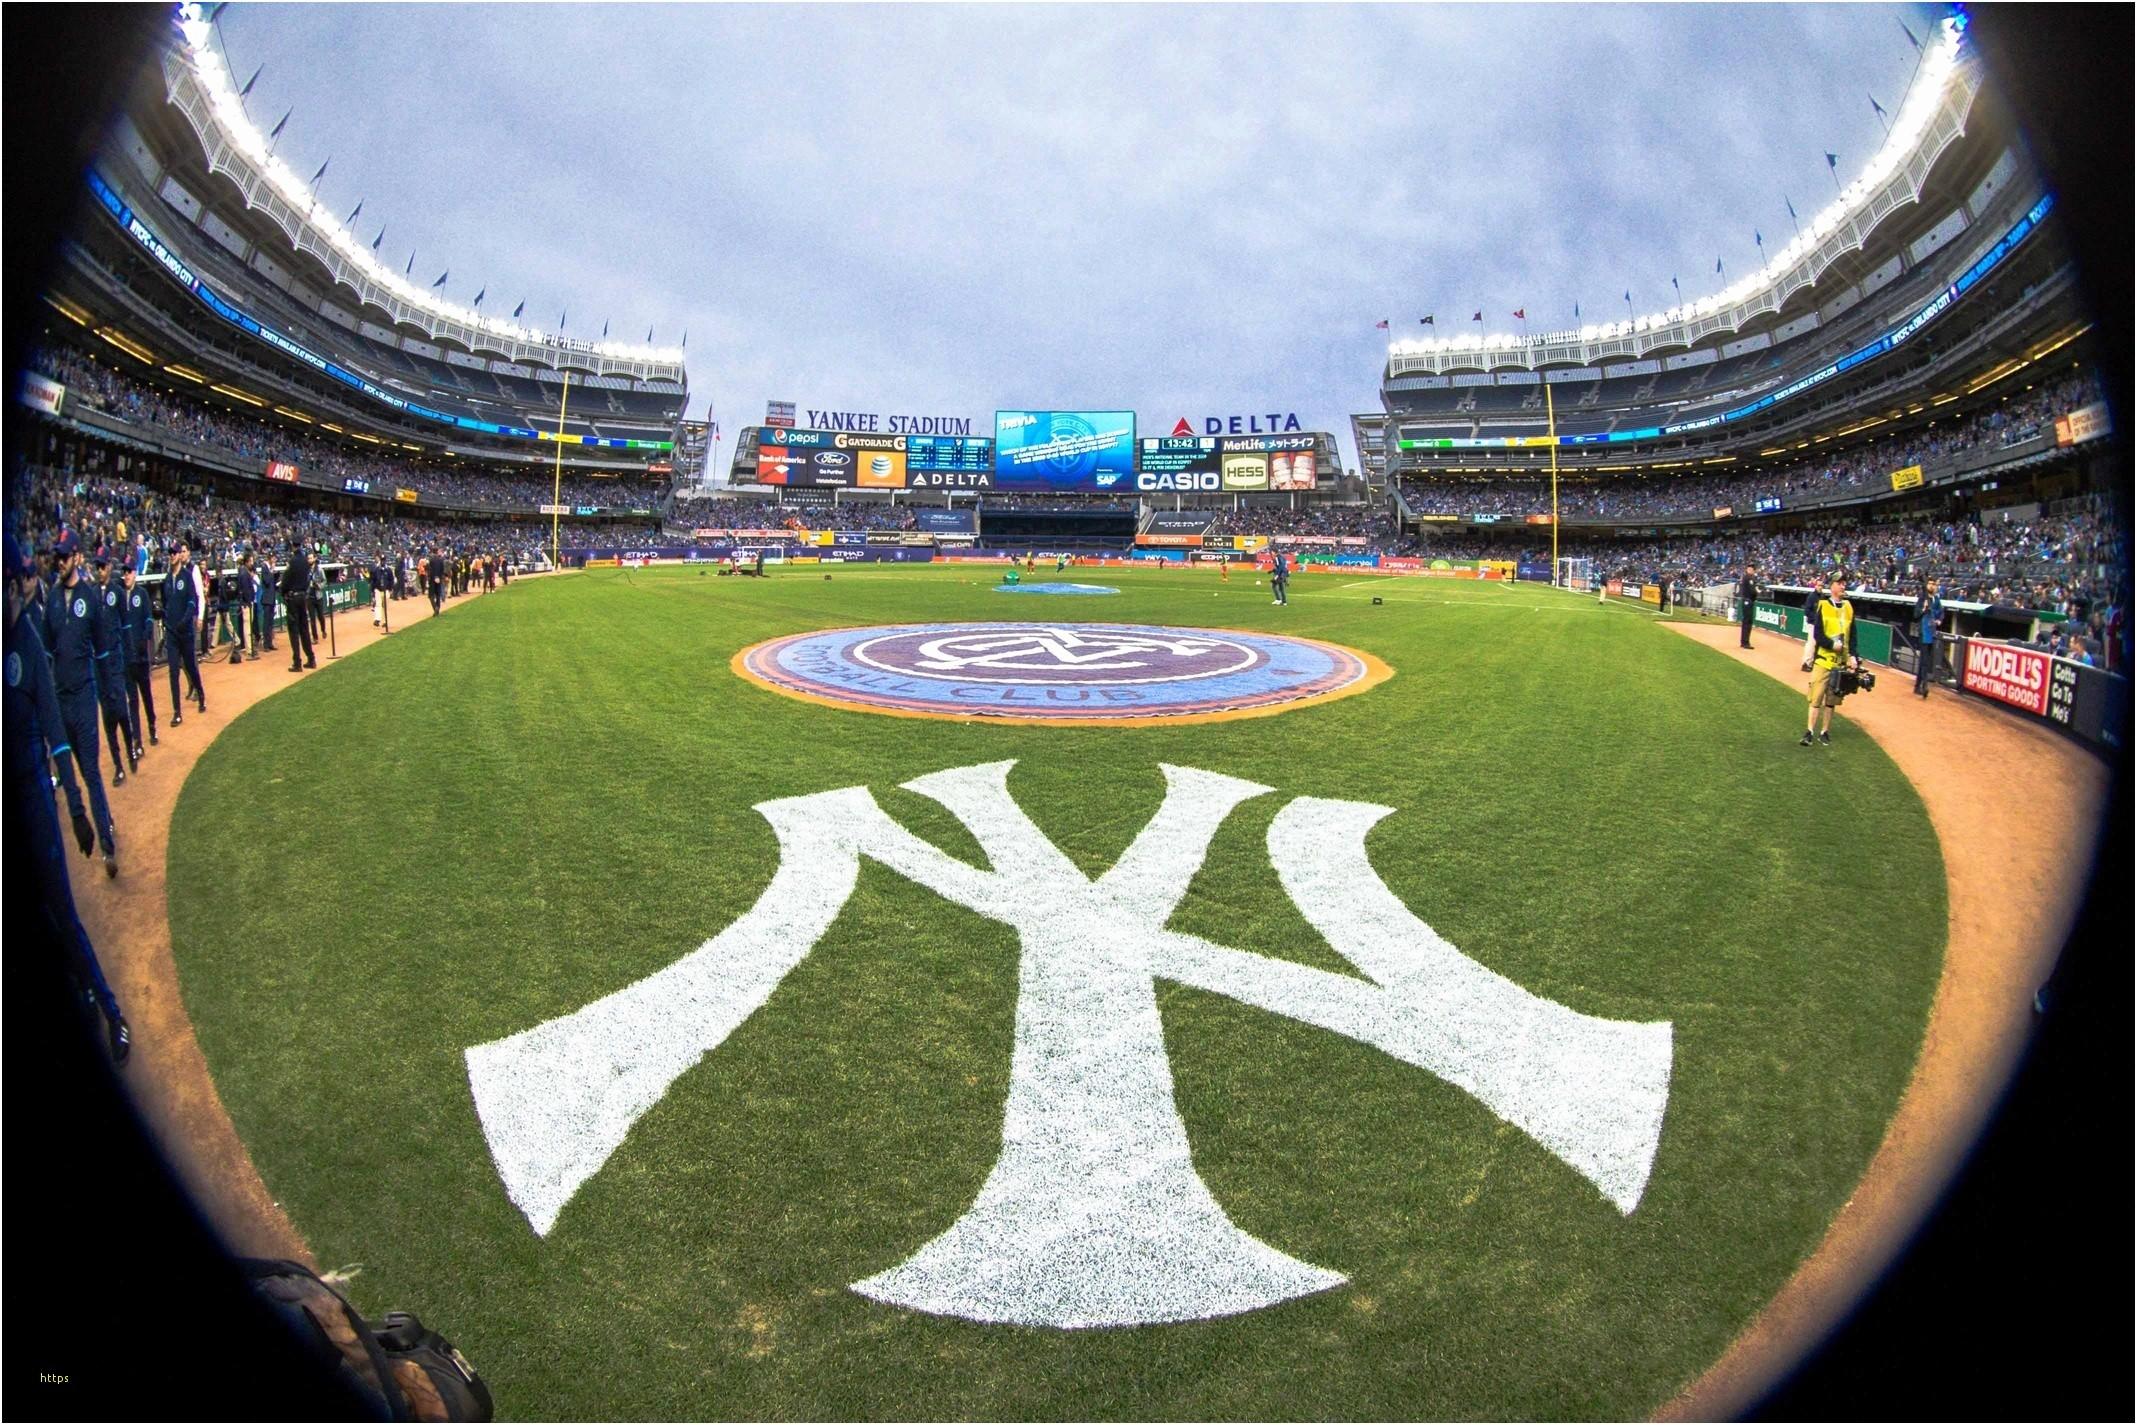 Res: 2137x1425, Yankee Stadium Football Seating Chart Awesome Yankee Stadium Wallpaper 2018  64 Images